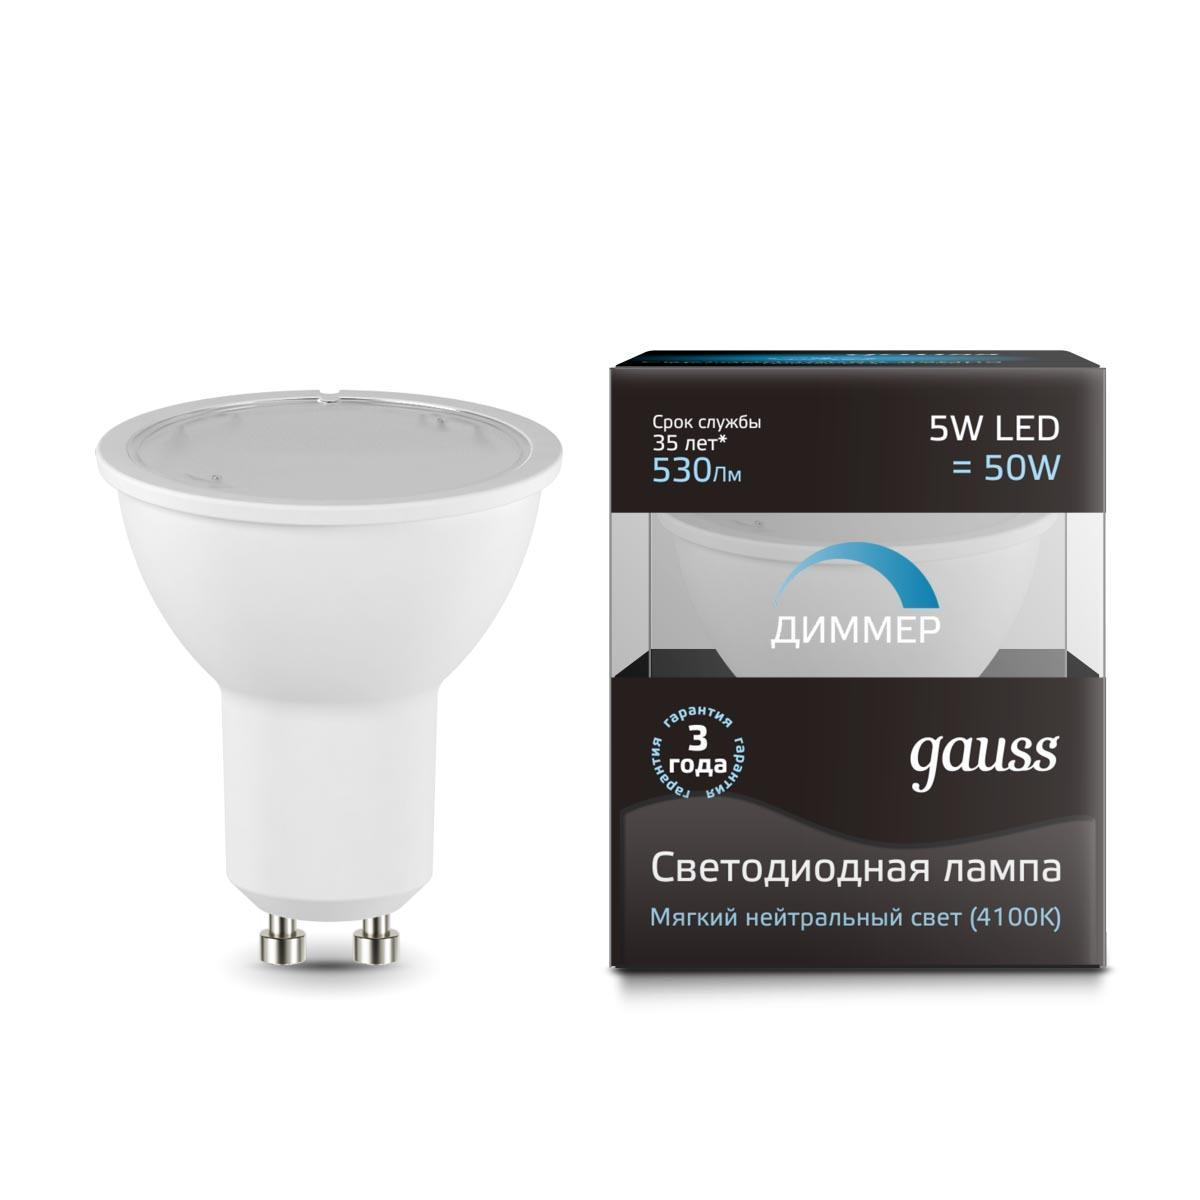 Лампа светодиодная диммируемая GU10 5W 4100K матовая 101506205-D goodeck лампа светодиодная goodeck рефлекторная матовая gu10 5 5w 4100k gl1007024206